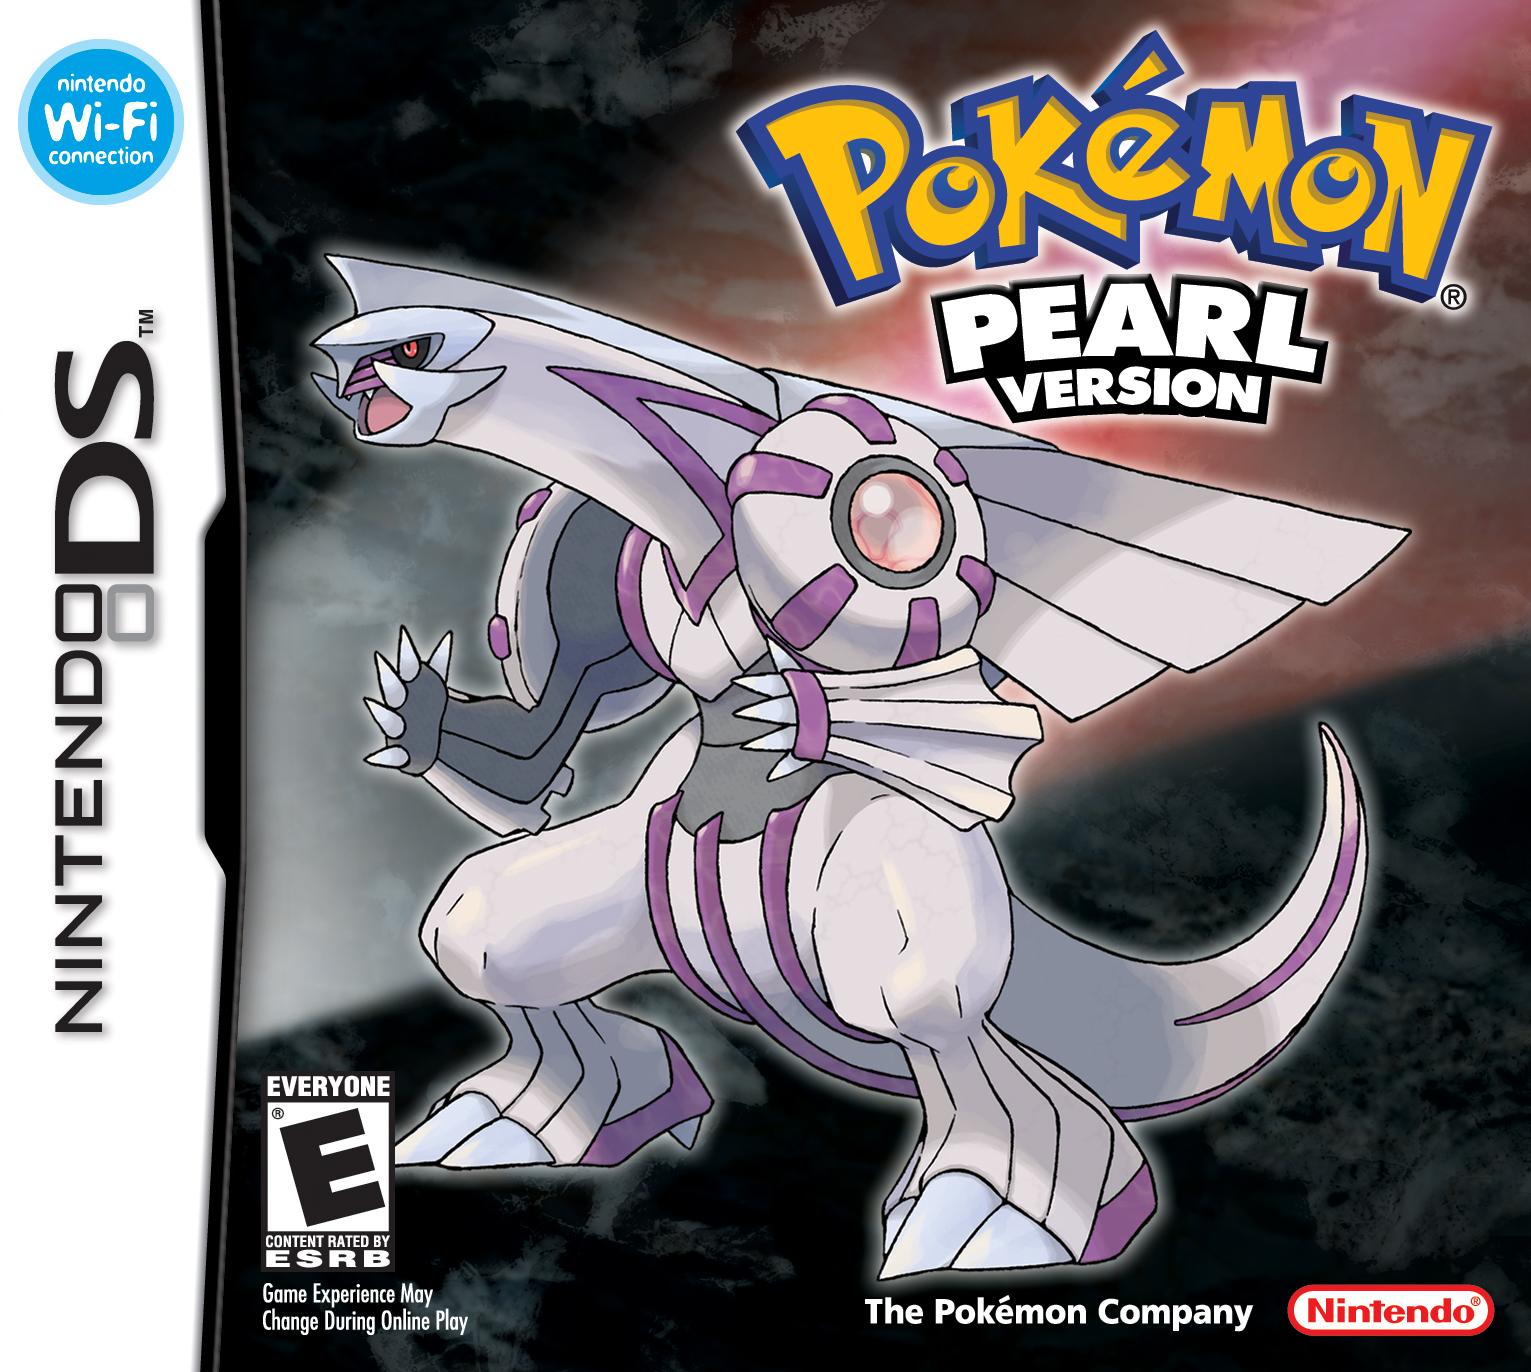 pokémon diamond and pearl version | pokémon wiki | fandom powered